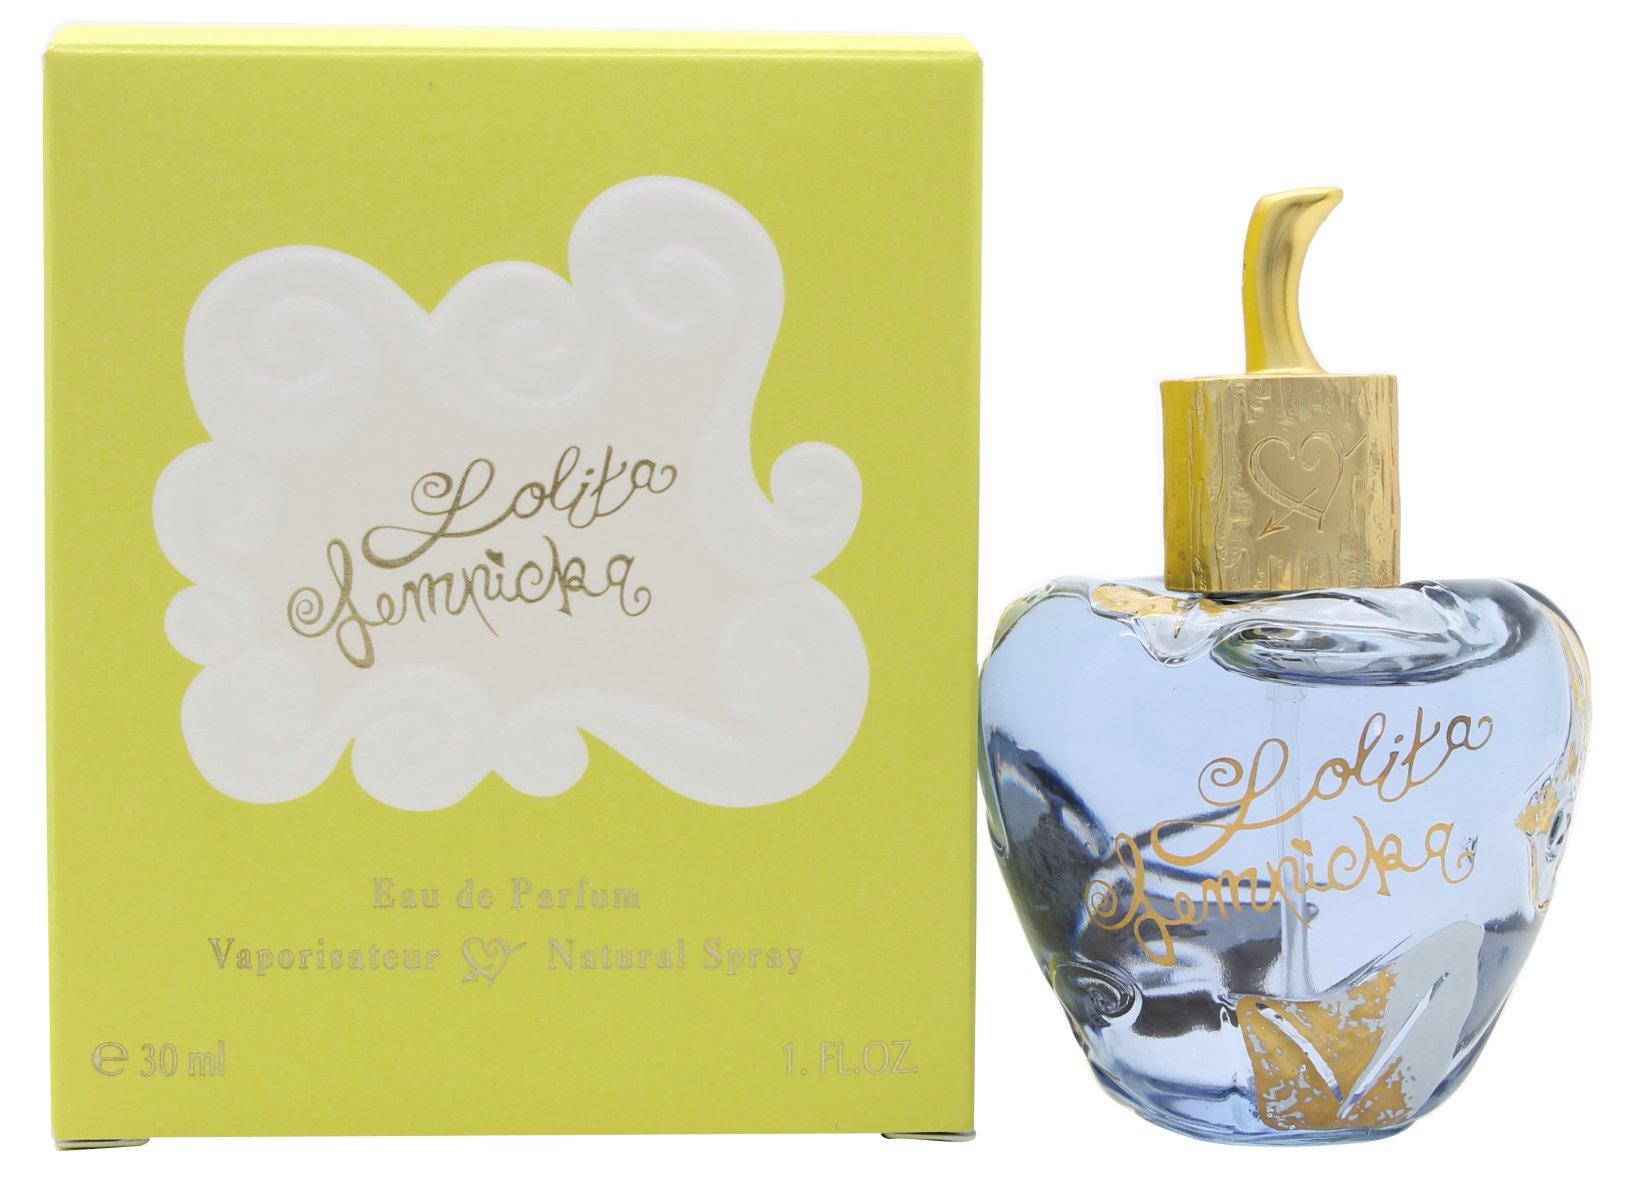 Lolita Lempicka Lolita Lempicka, Parfémovaná voda, 30ml, Dámska vôňa, + AKCE: dárek zdarma